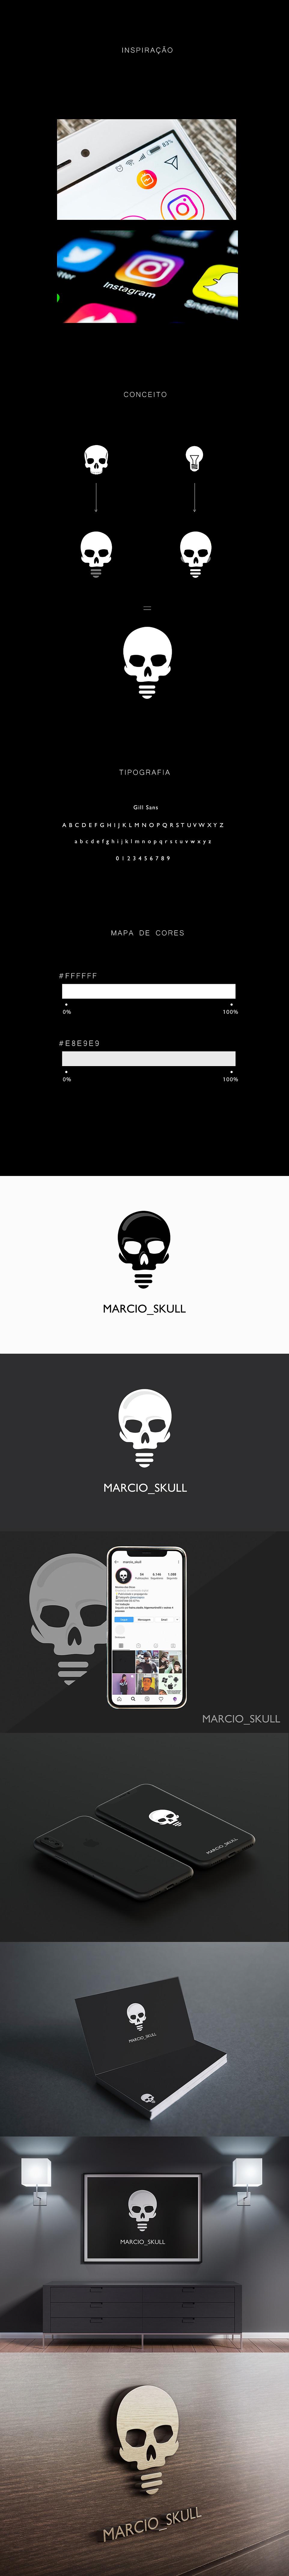 Marcio_Skull_apresentação.jpg